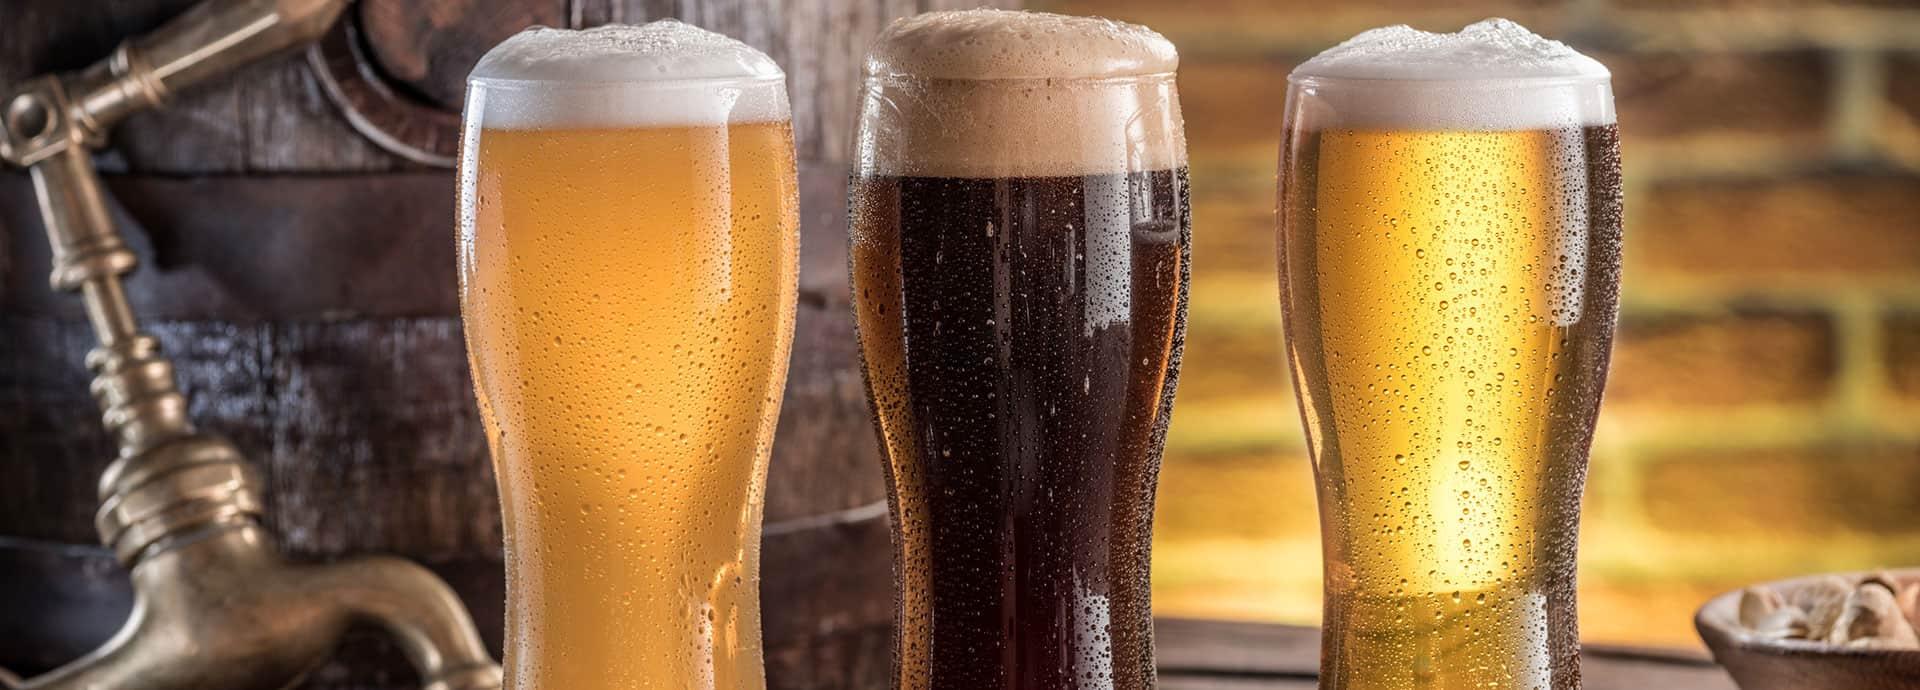 birre nuova header 1